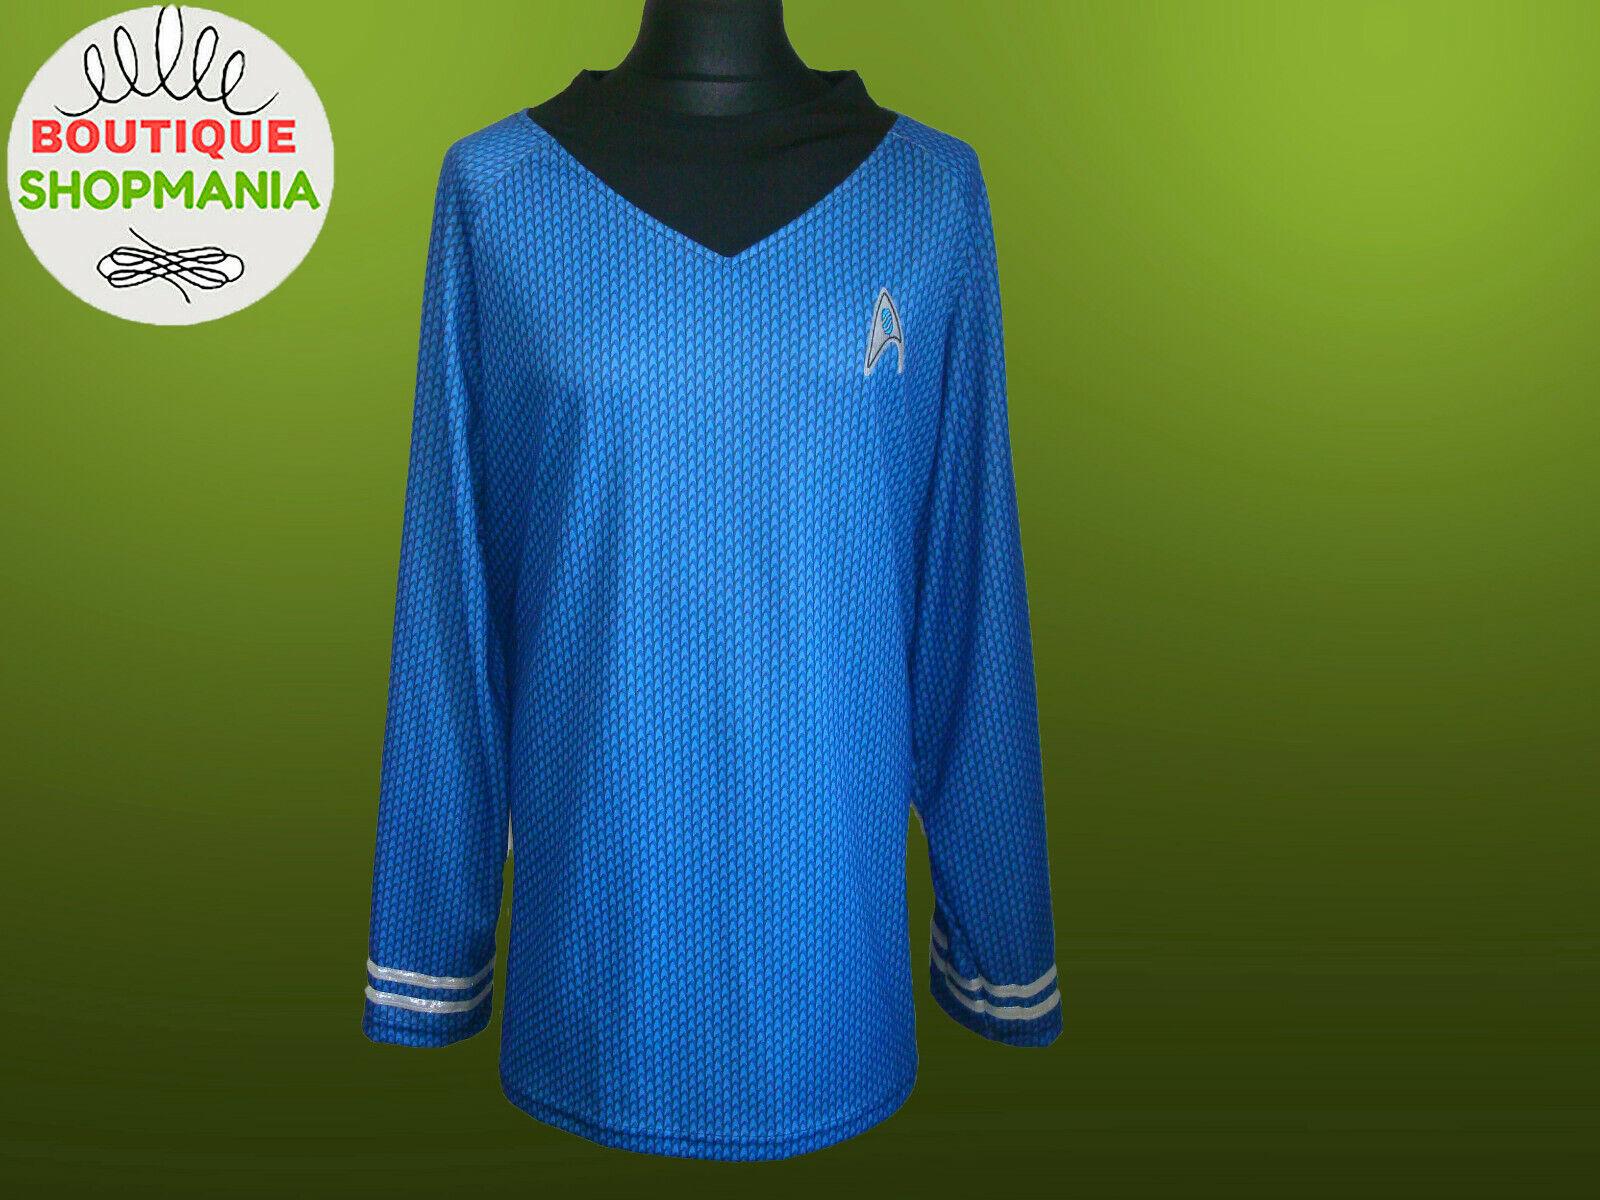 STAR TREK Costume OFFICER SPOCK Rubies XL 46-52 Long Sleeve SHIRT Blue Cosplay